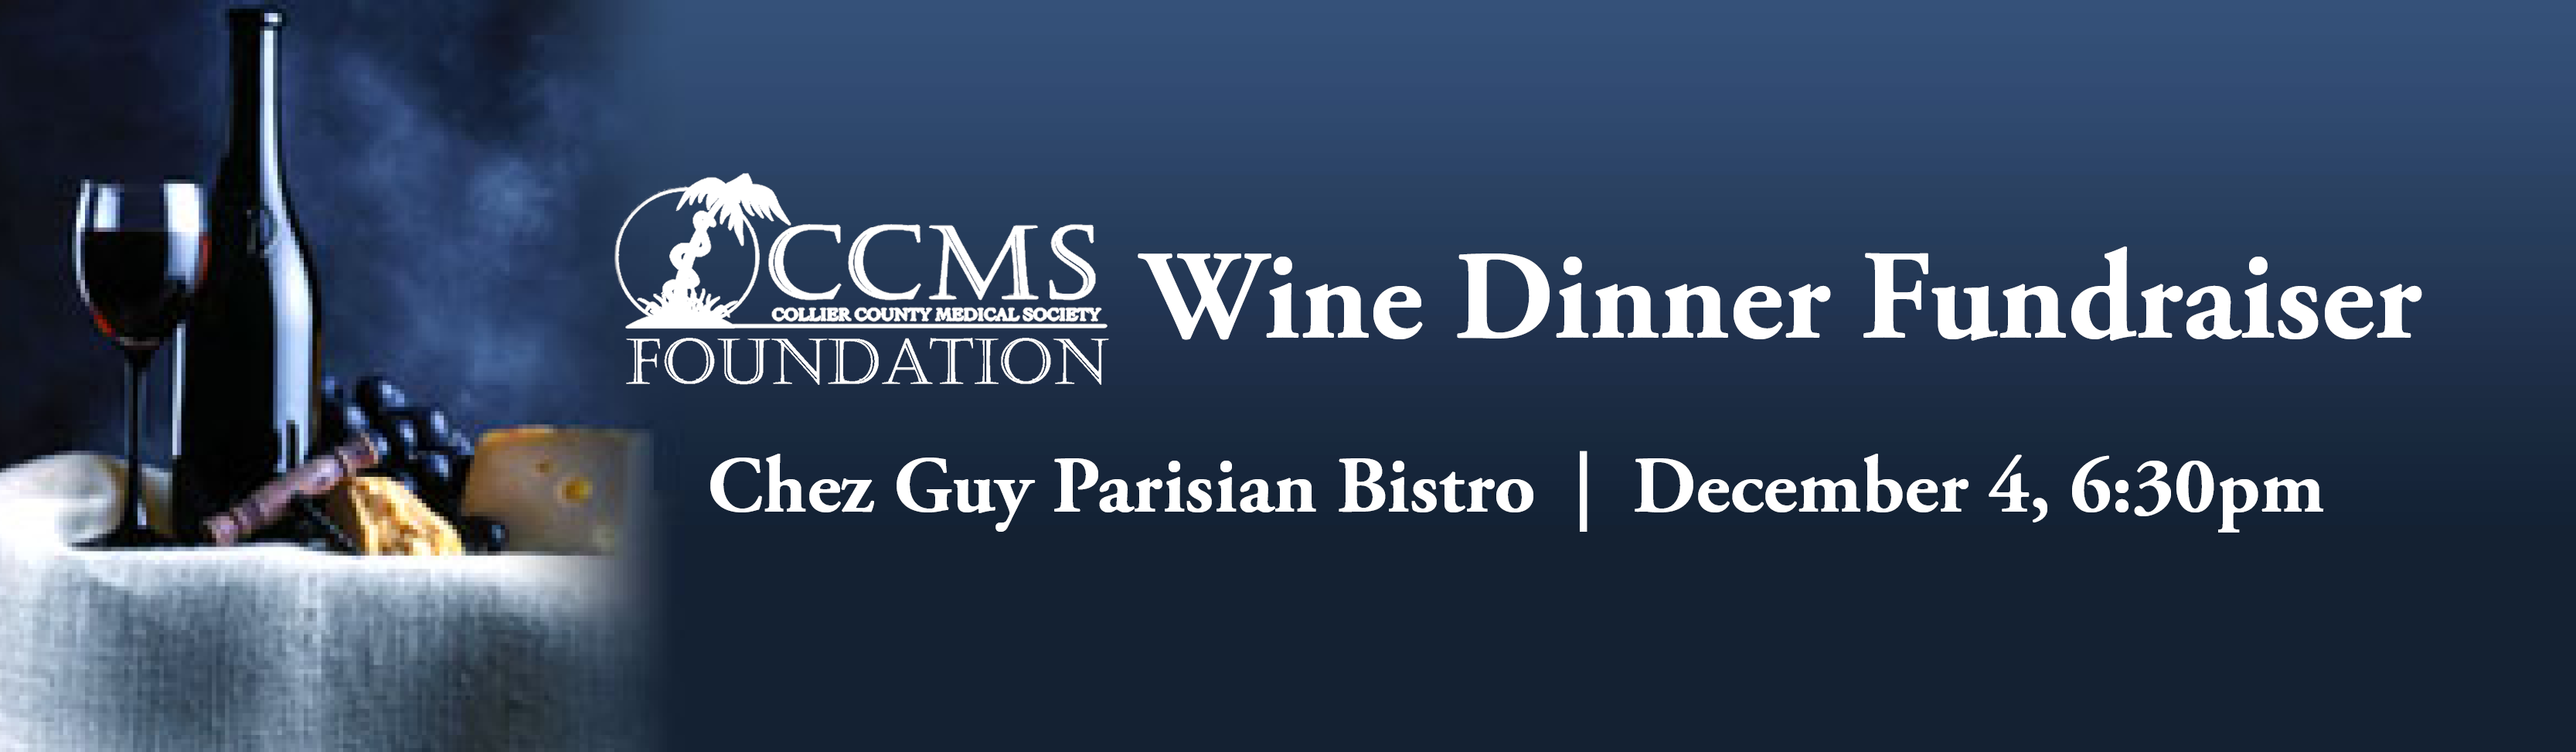 FCCMS Wine Dinner Banner